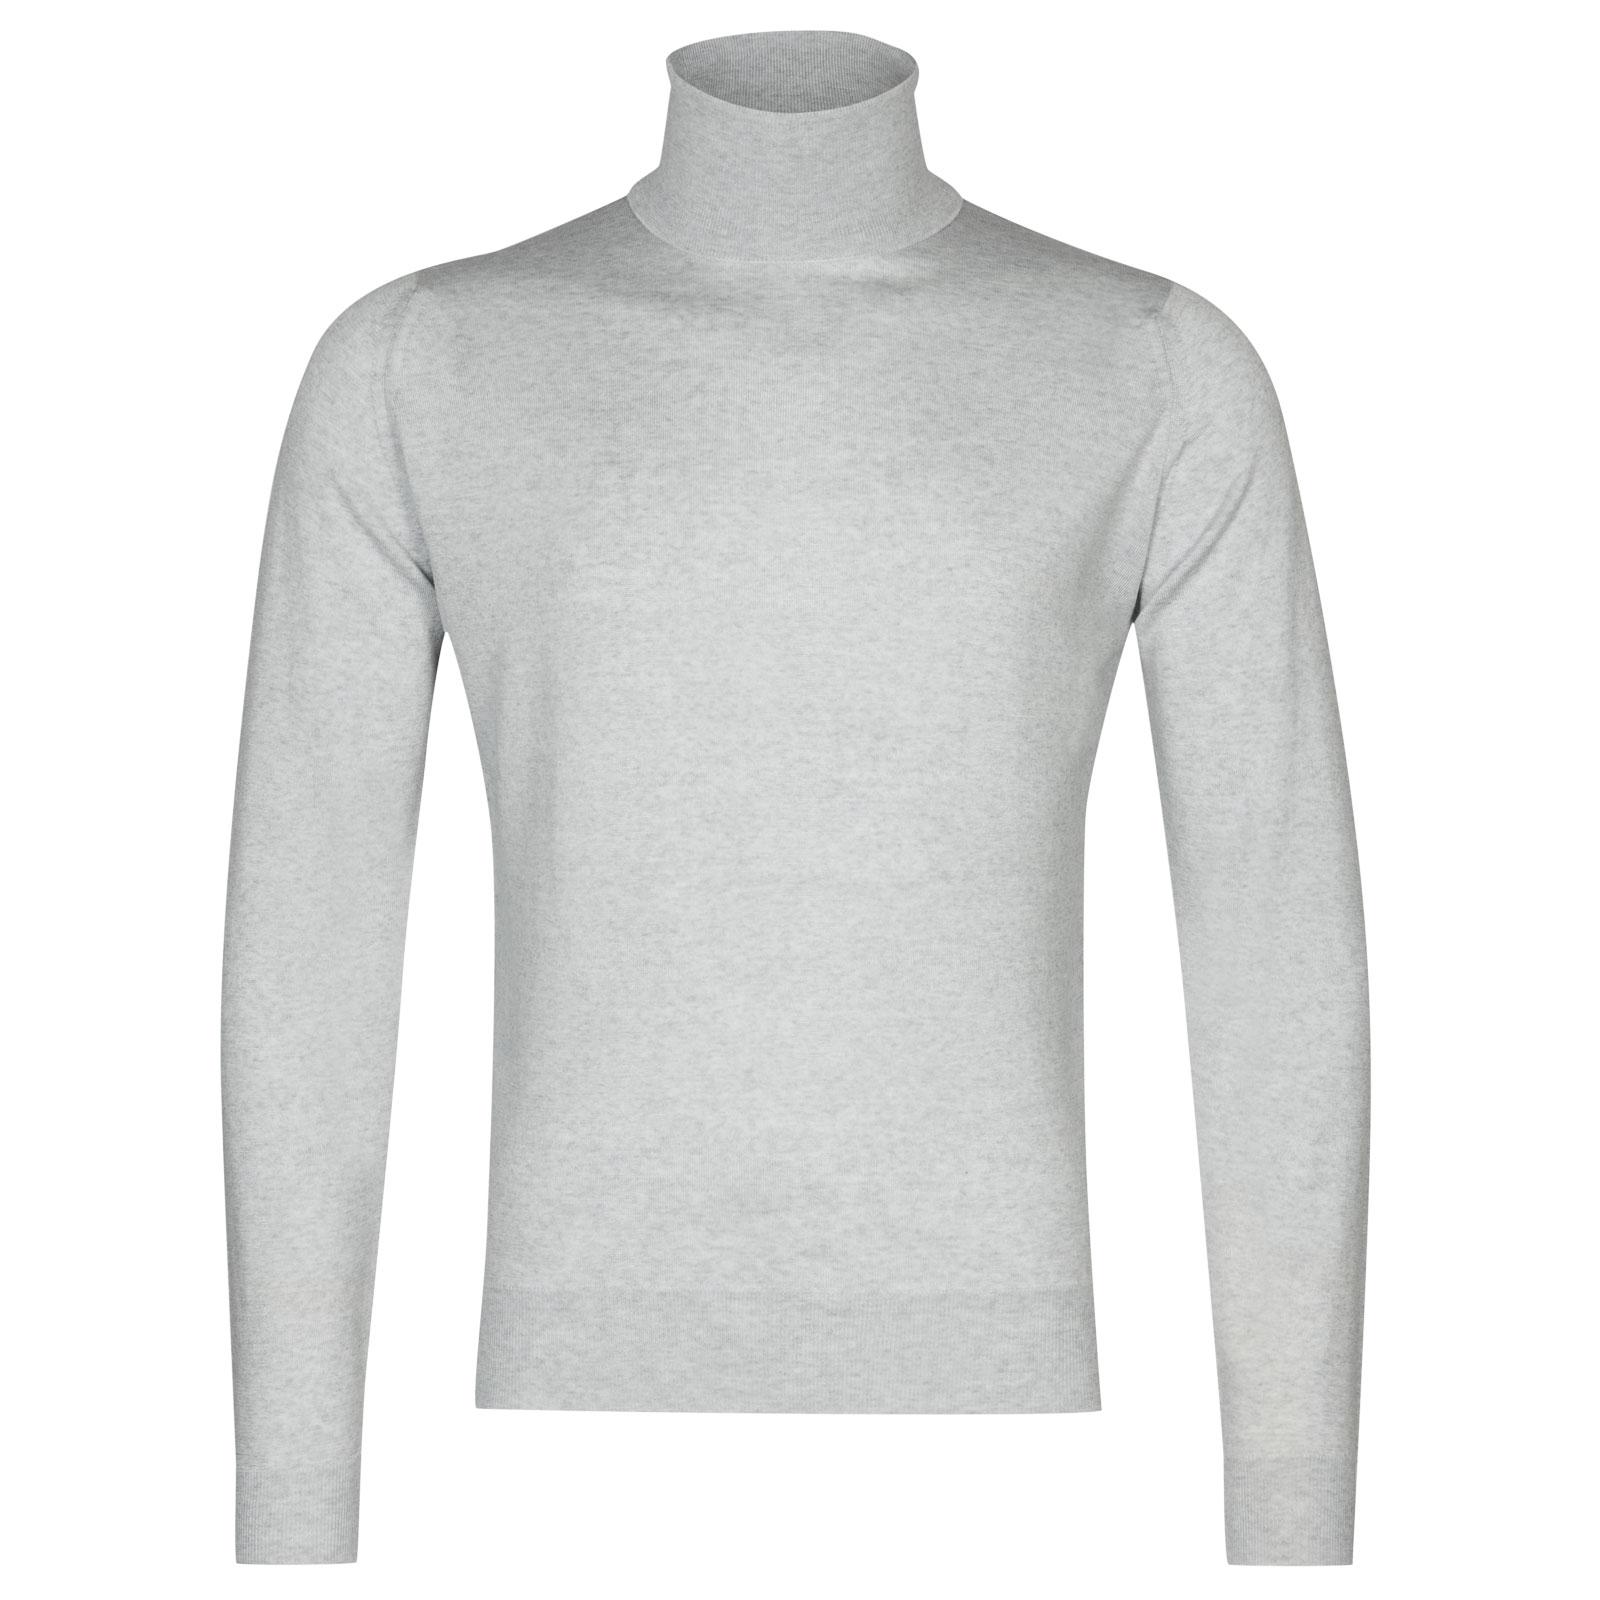 John Smedley Orta Merino Wool Pullover in Bardot Grey-L